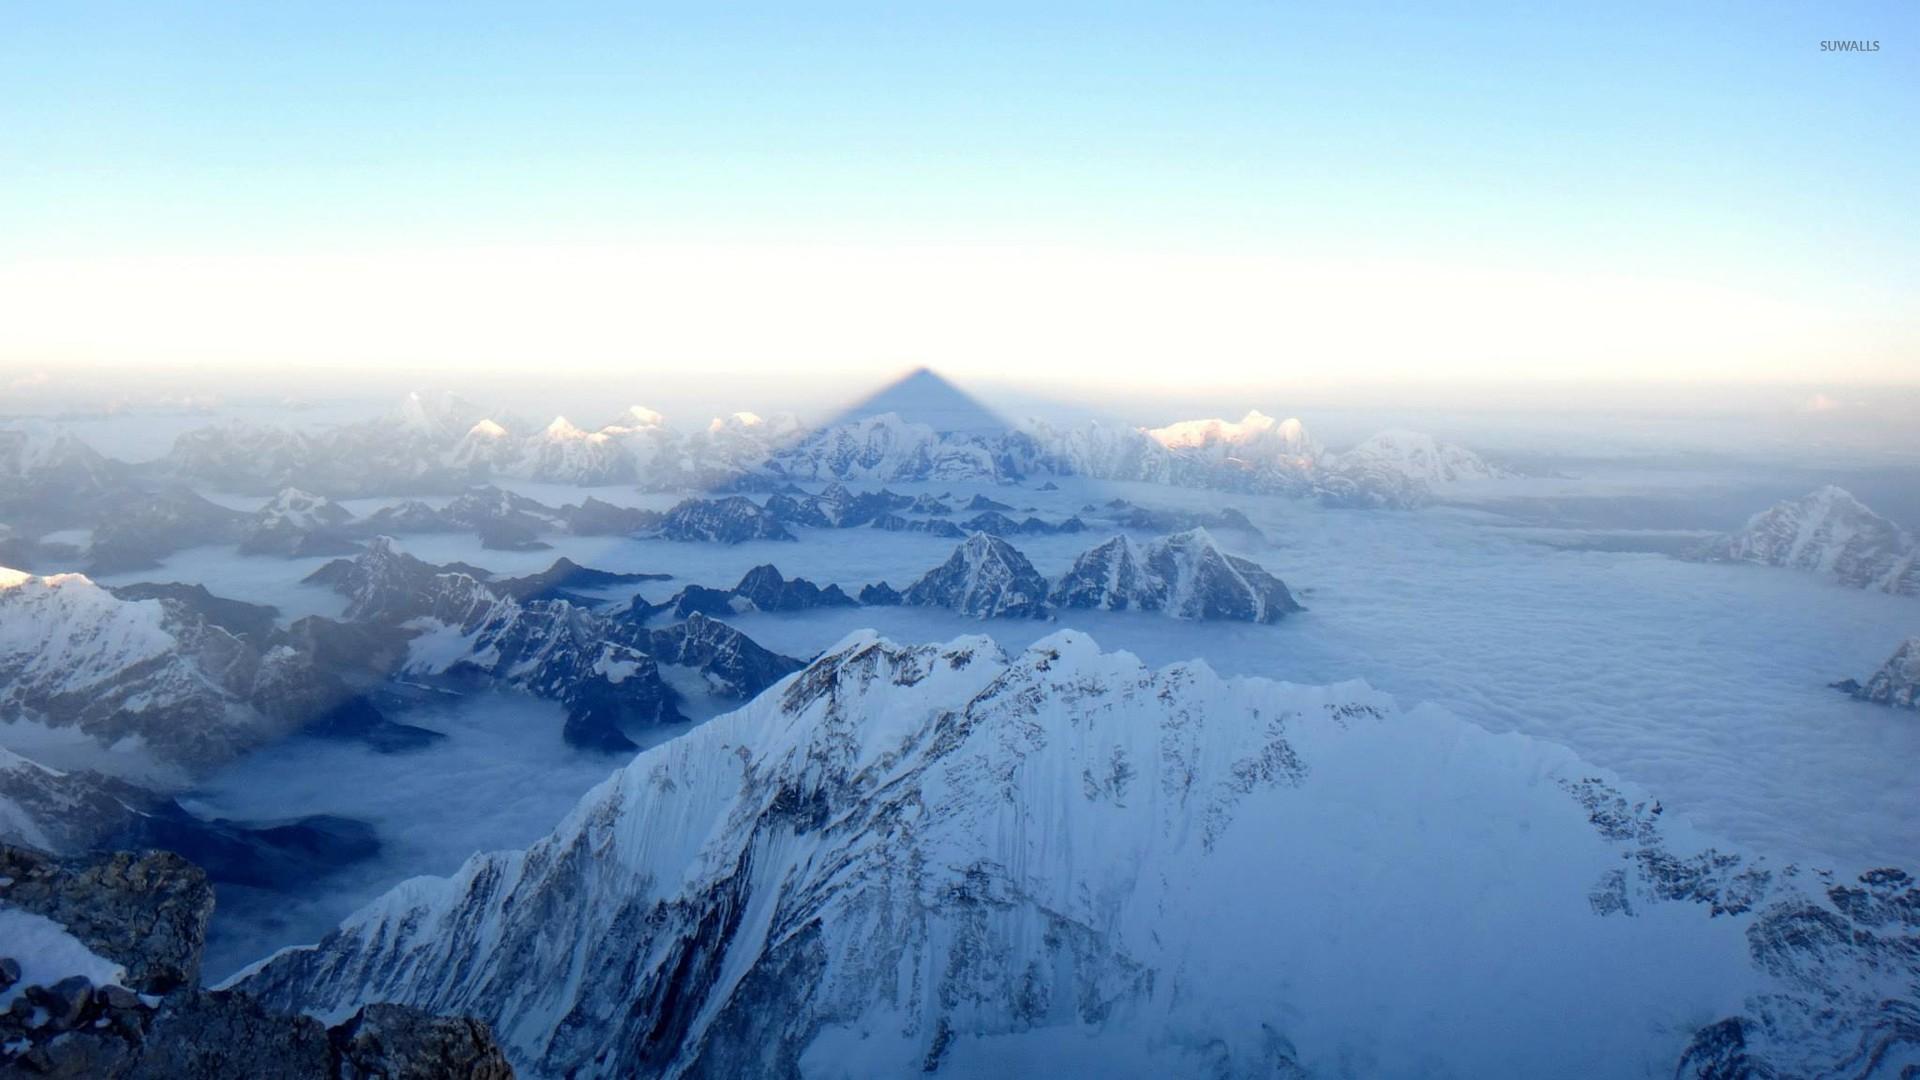 Mount Everest 3 Wallpaper Nature Wallpapers 26108